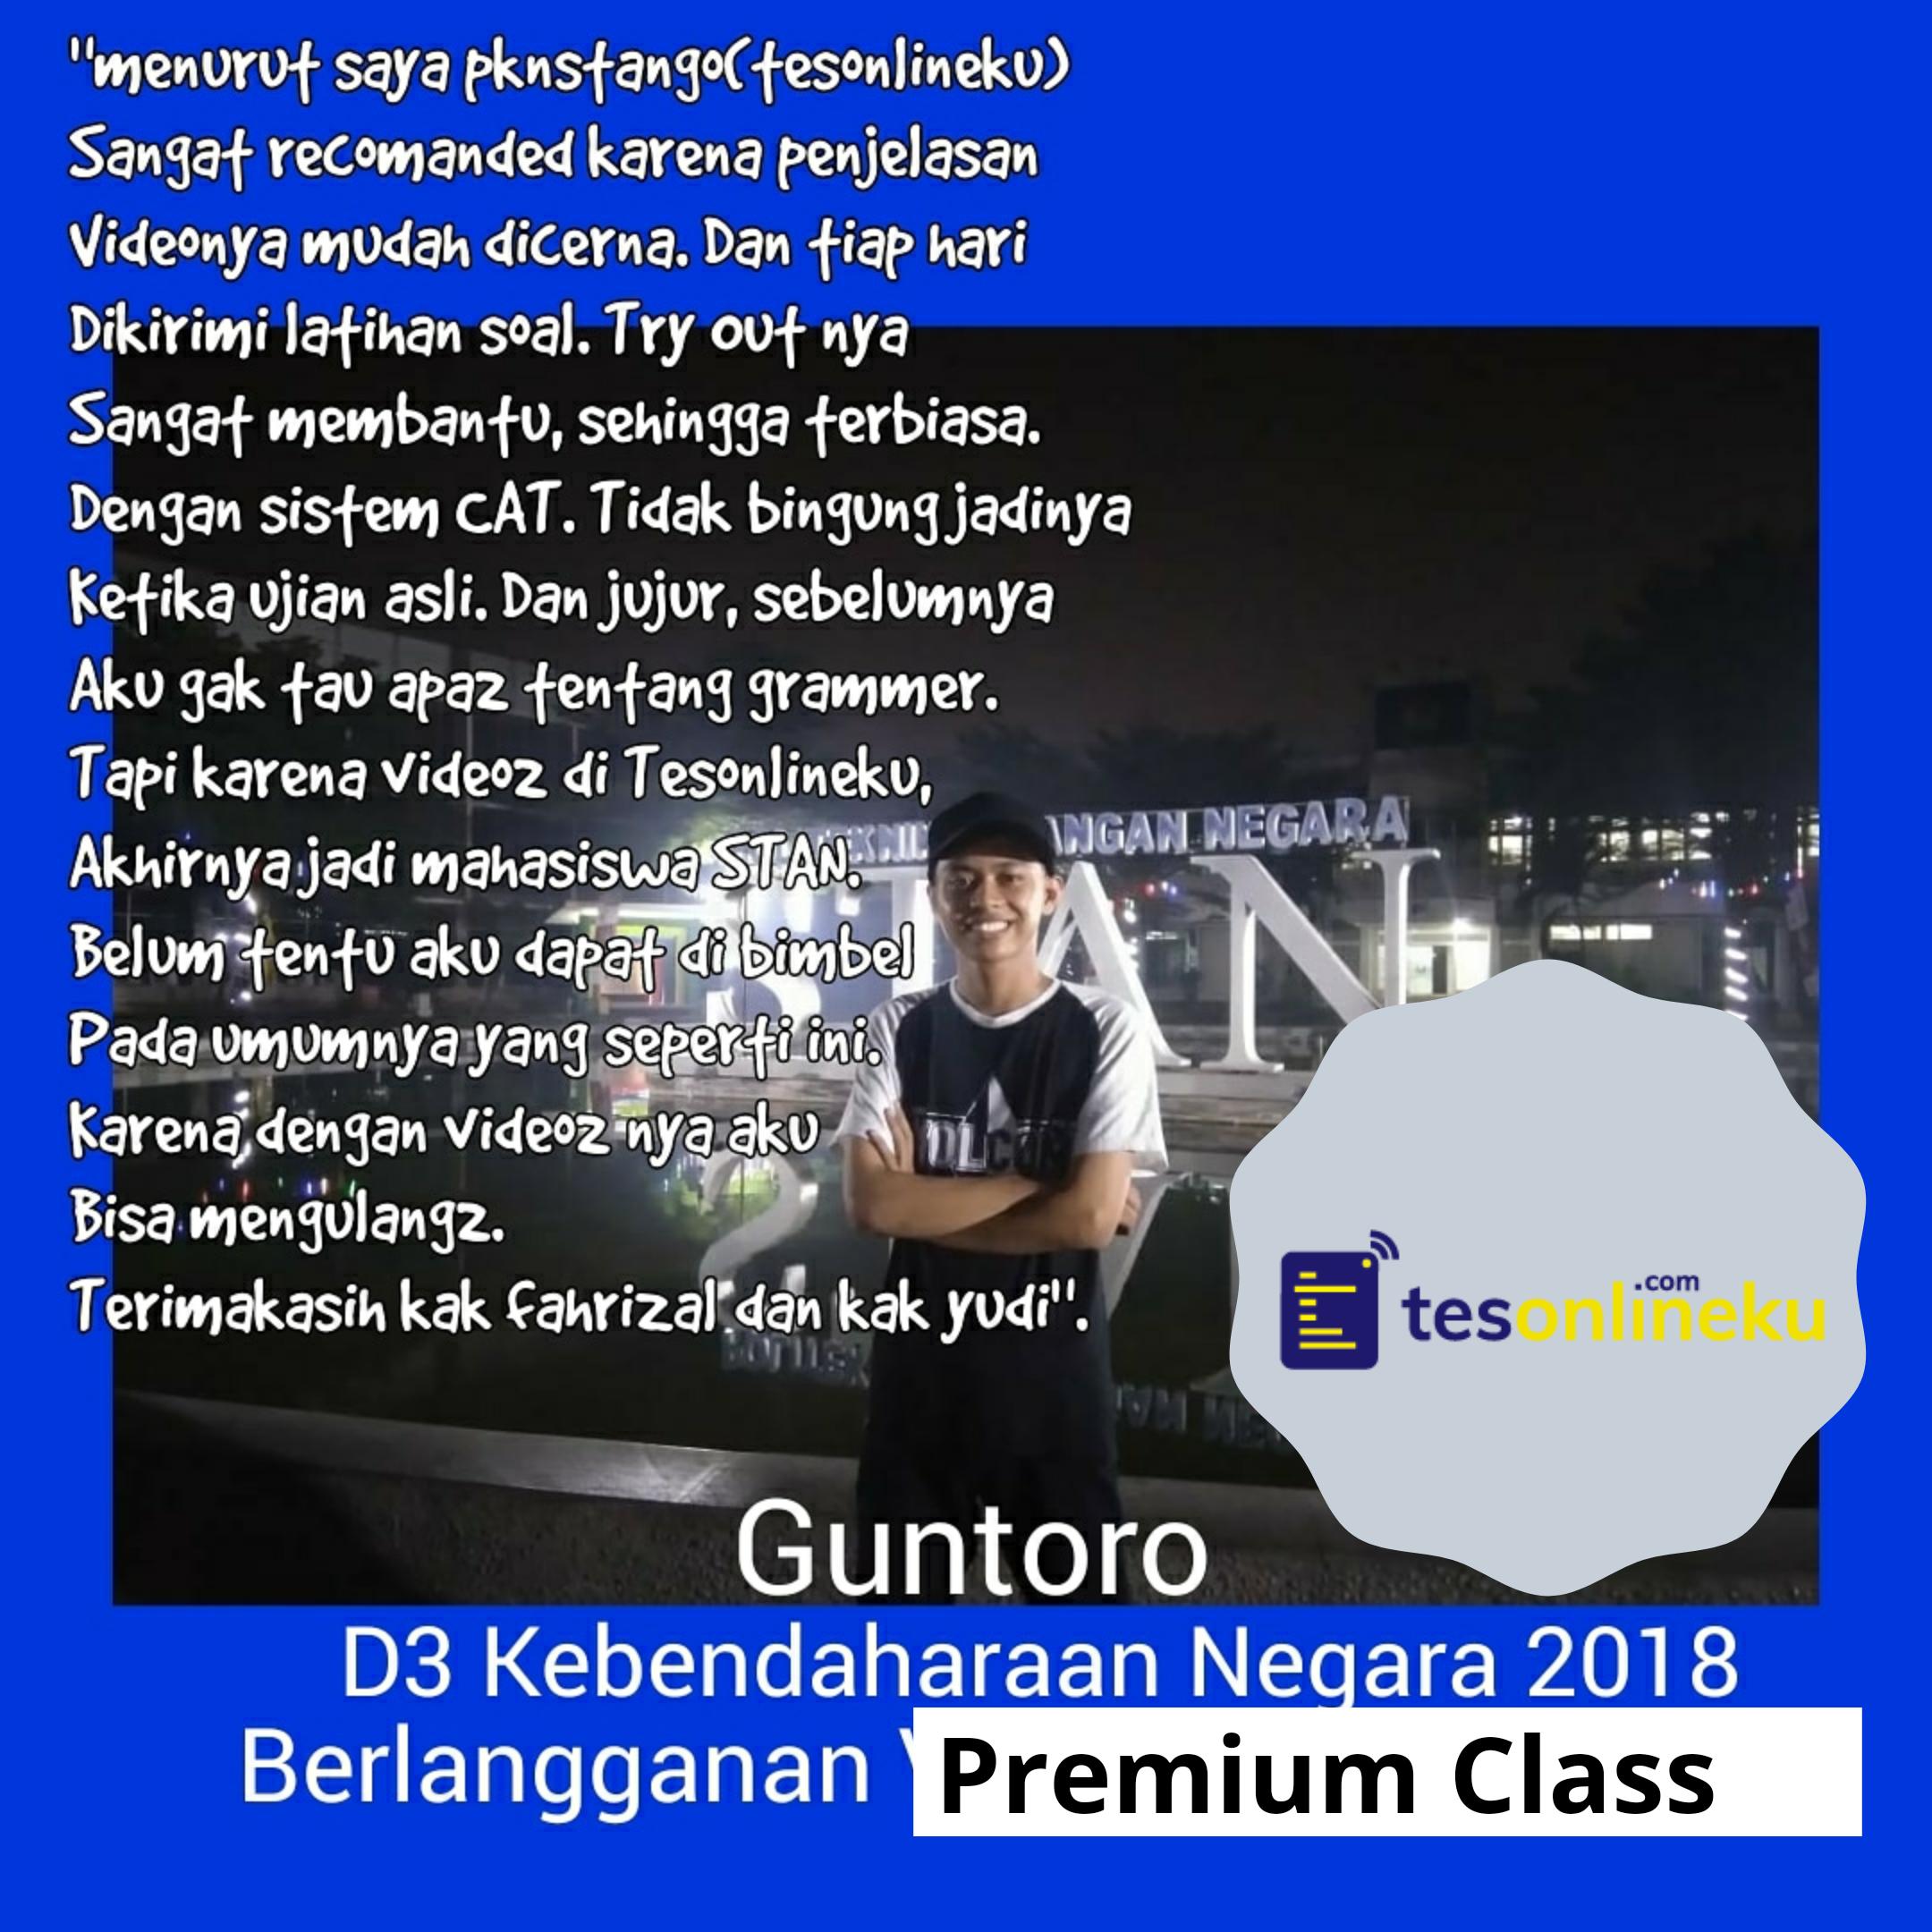 Guntoro (Lulus D3 Kebendaharaan Negara)